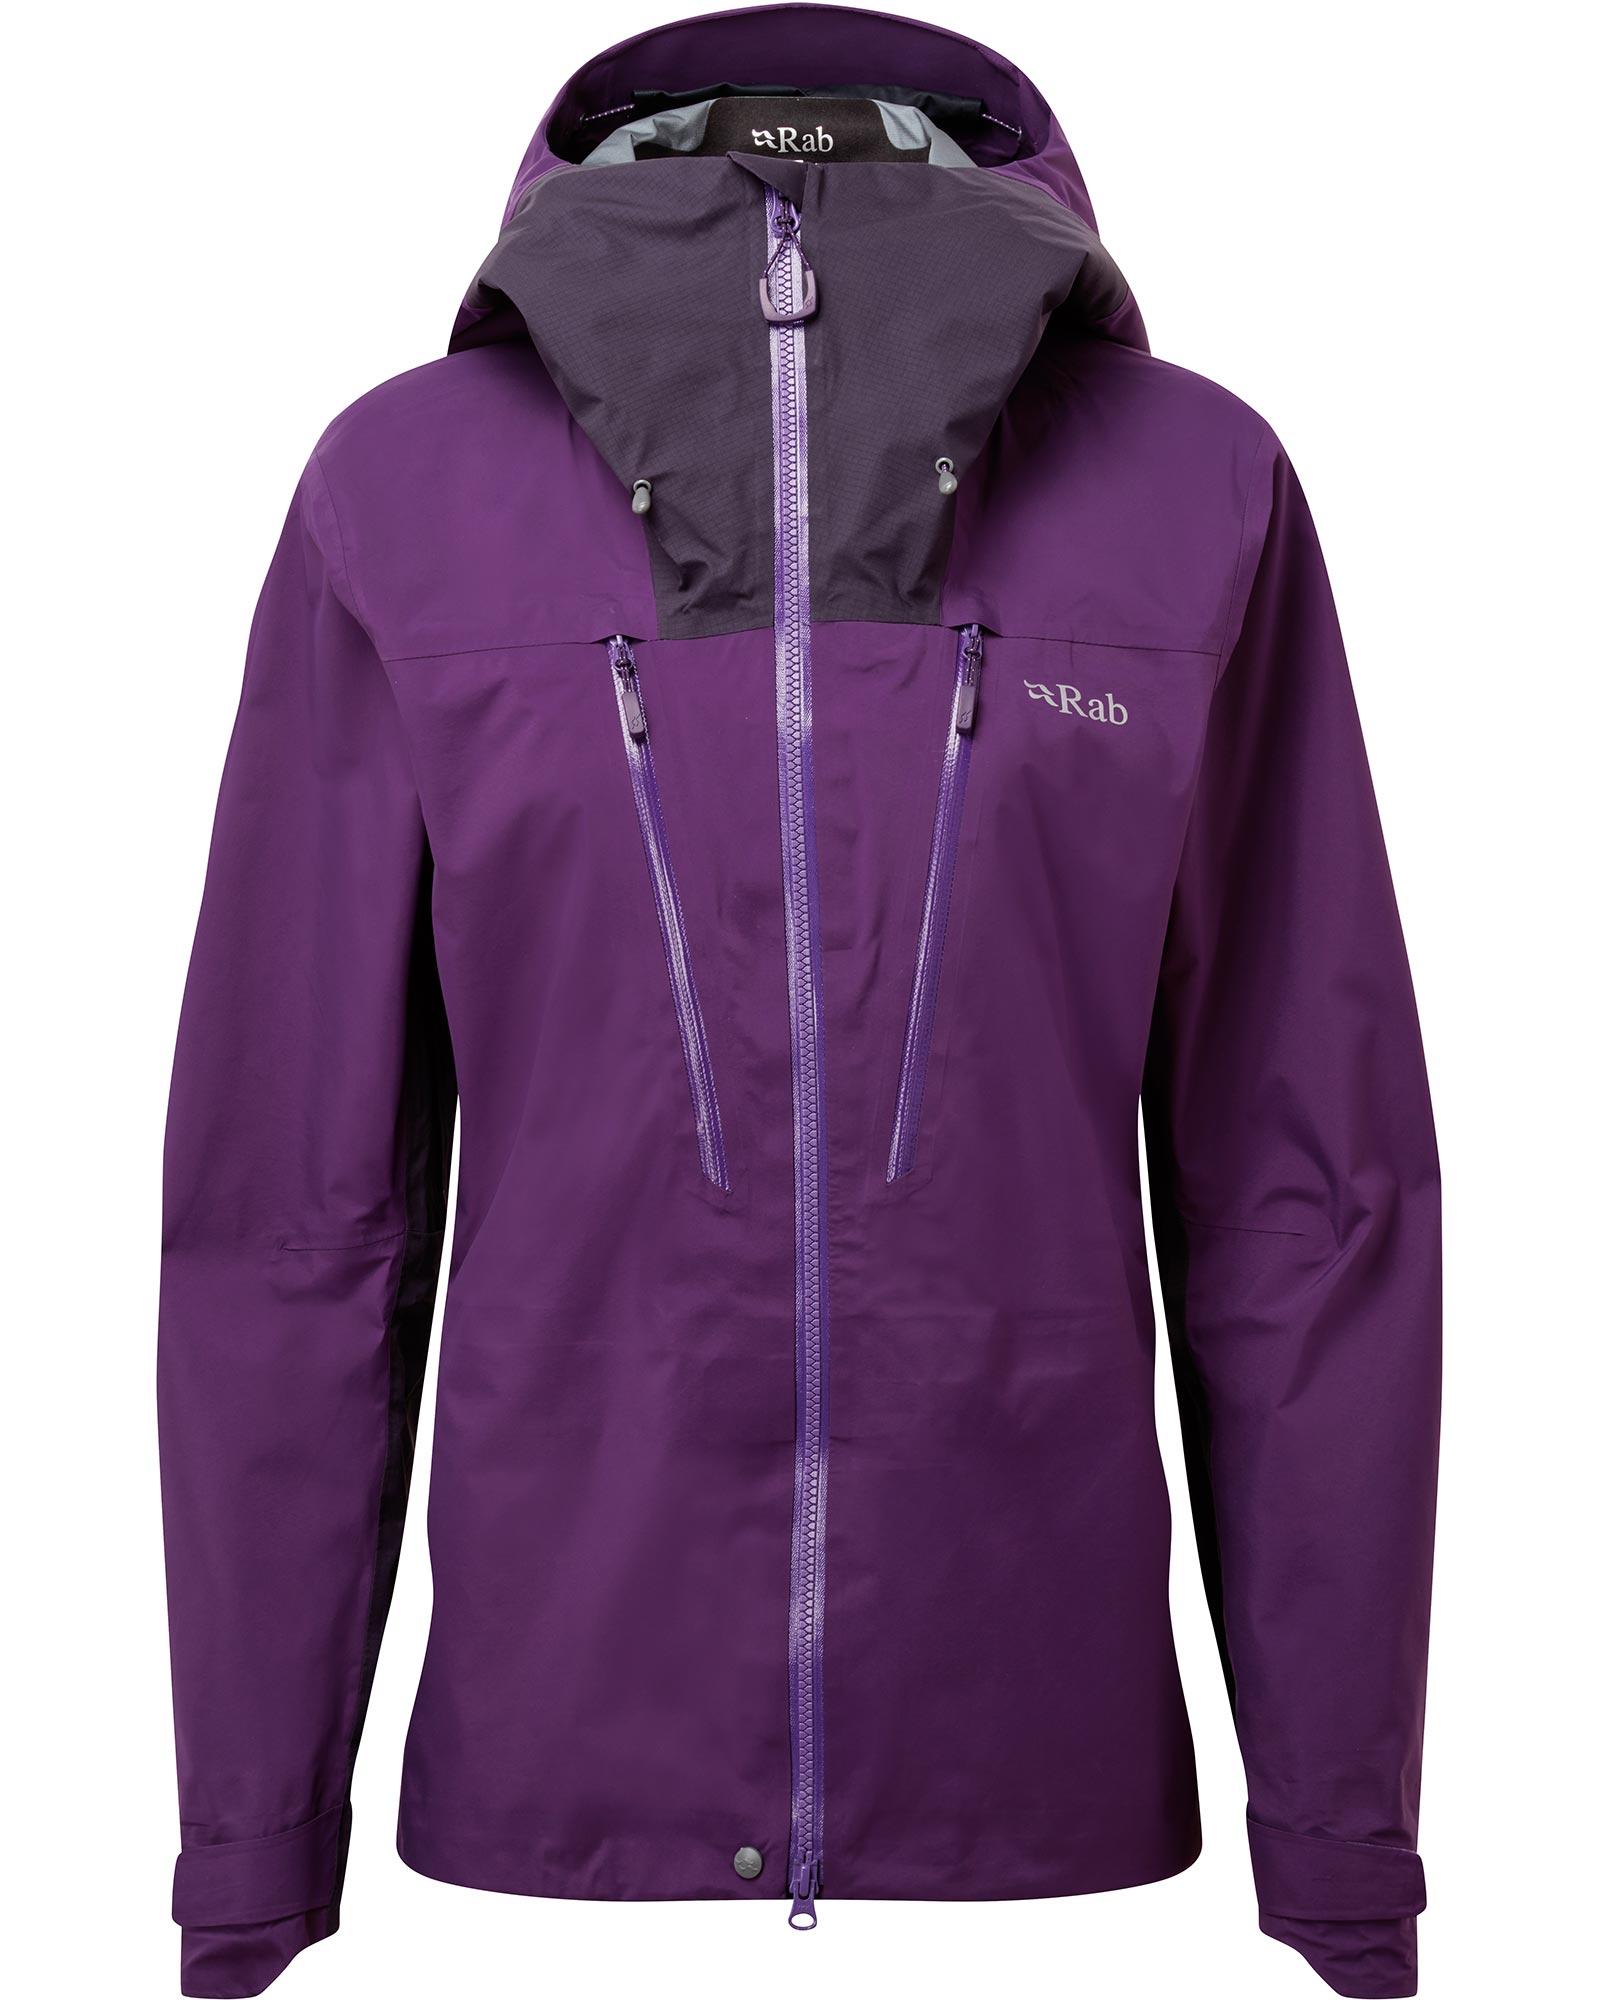 Rab Women's Muztag GORE-TEX Jacket 0